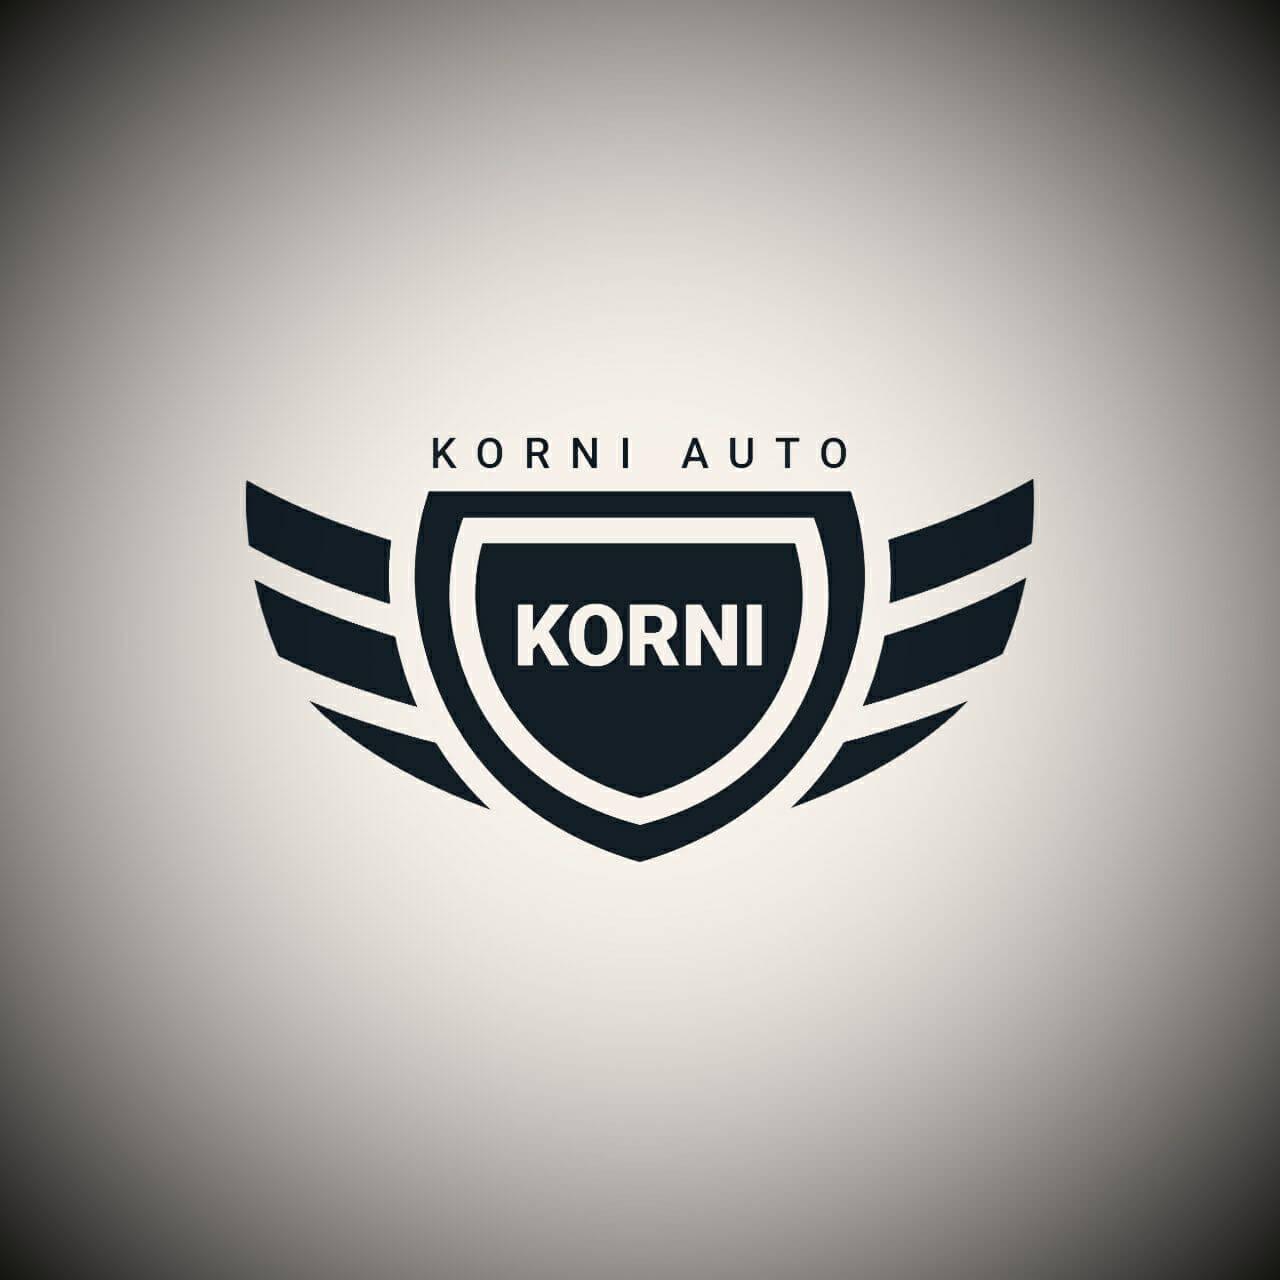 Korni auto 2017 – Auto delovi Kraljevo, opel, citroen, peugeot, renault